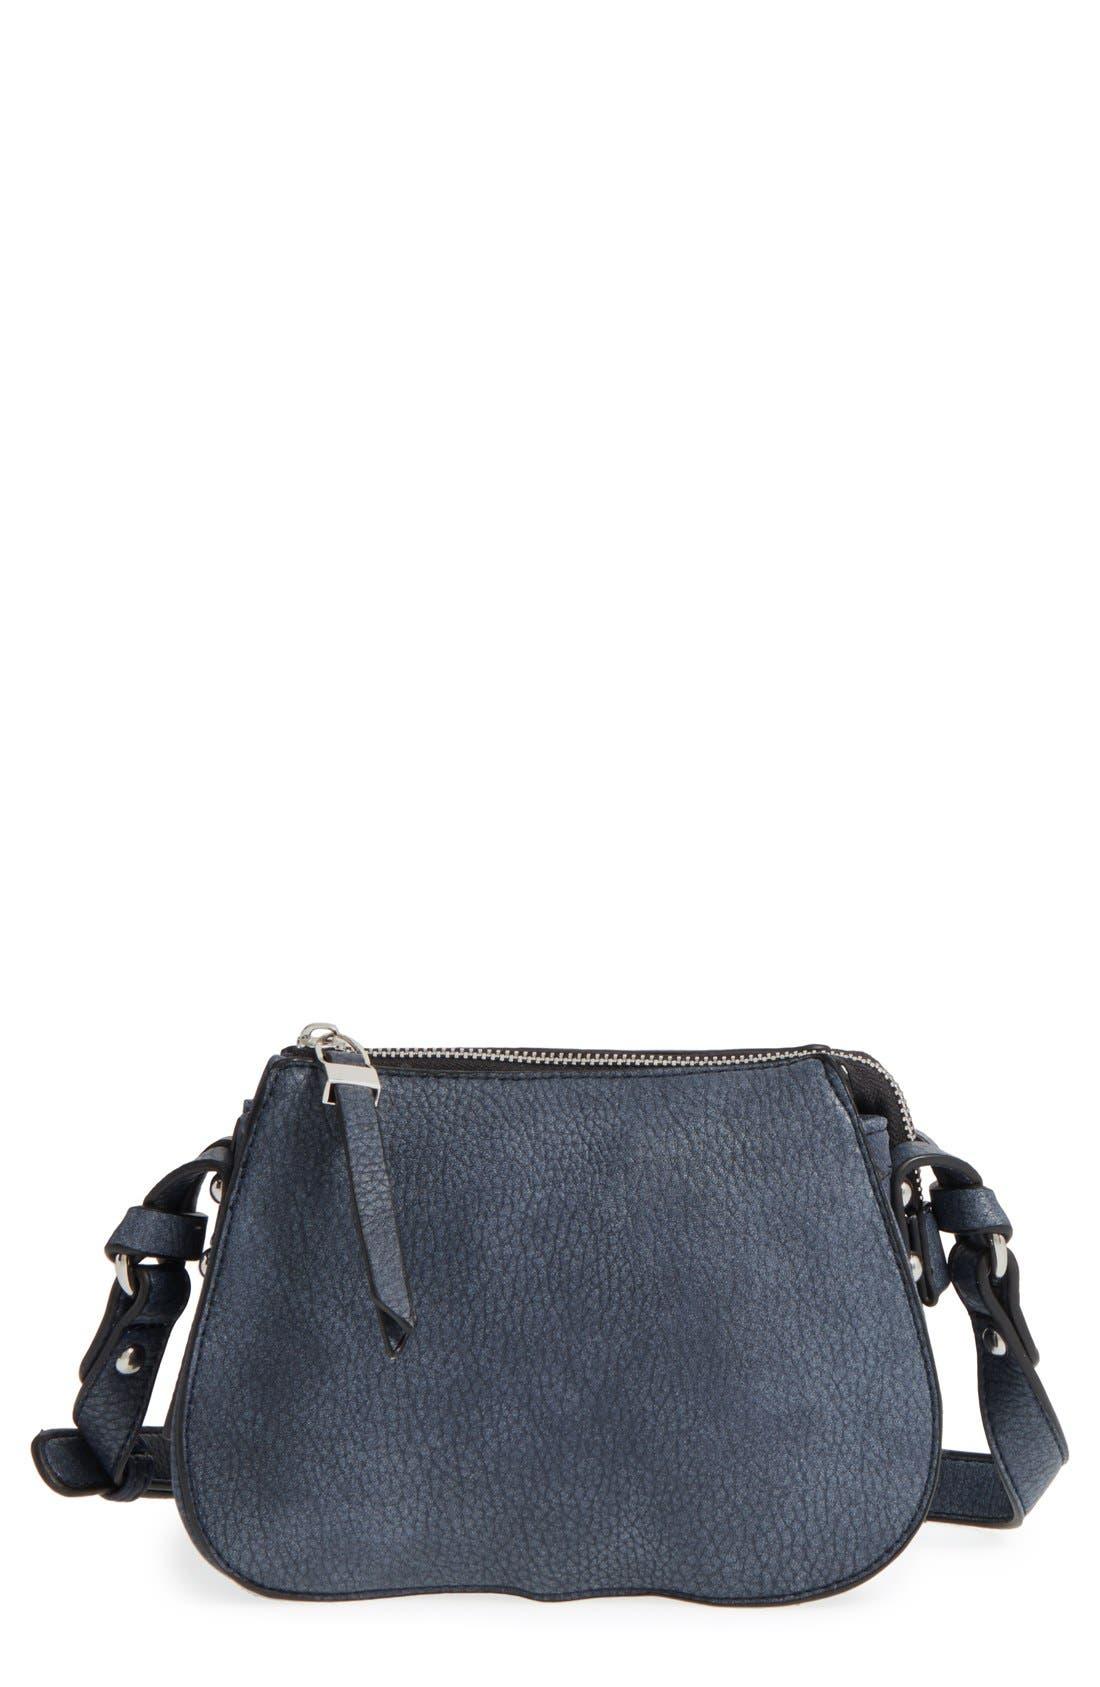 Main Image - Phase 3 Faux Leather Crossbody Bag